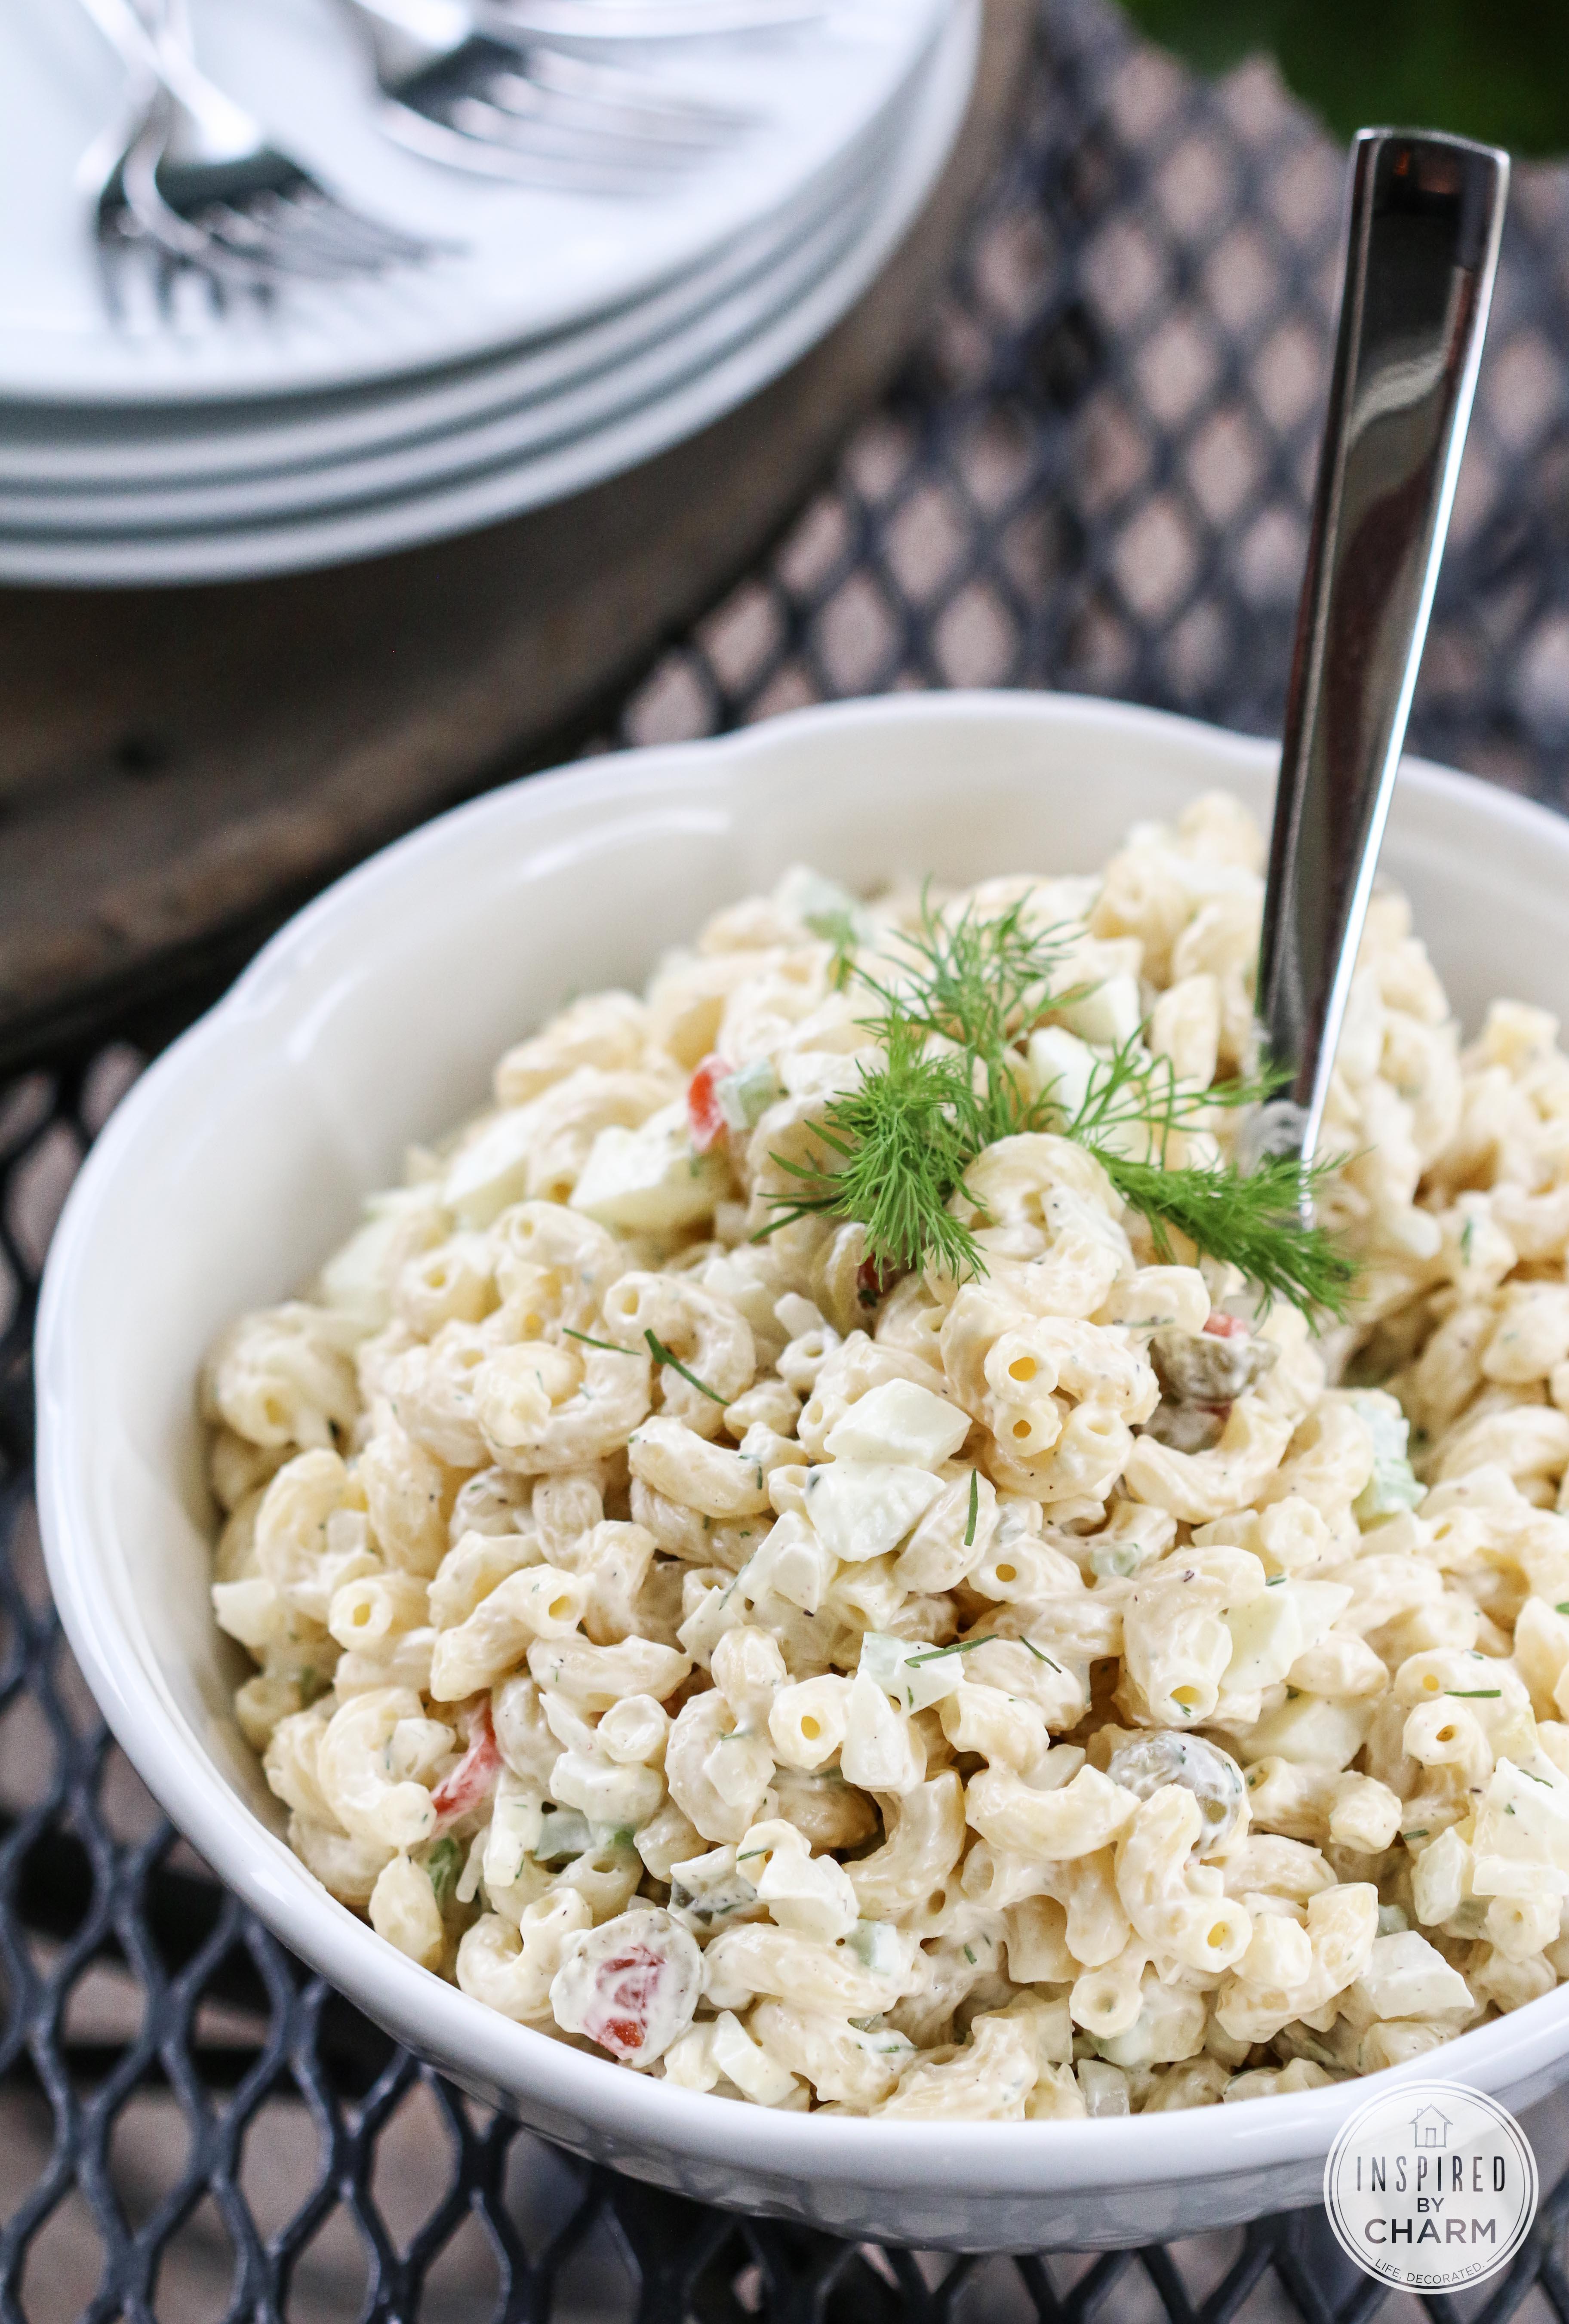 Really Good Macaroni Salad #macaronisalad #recipe #pasta #salad #macaroni